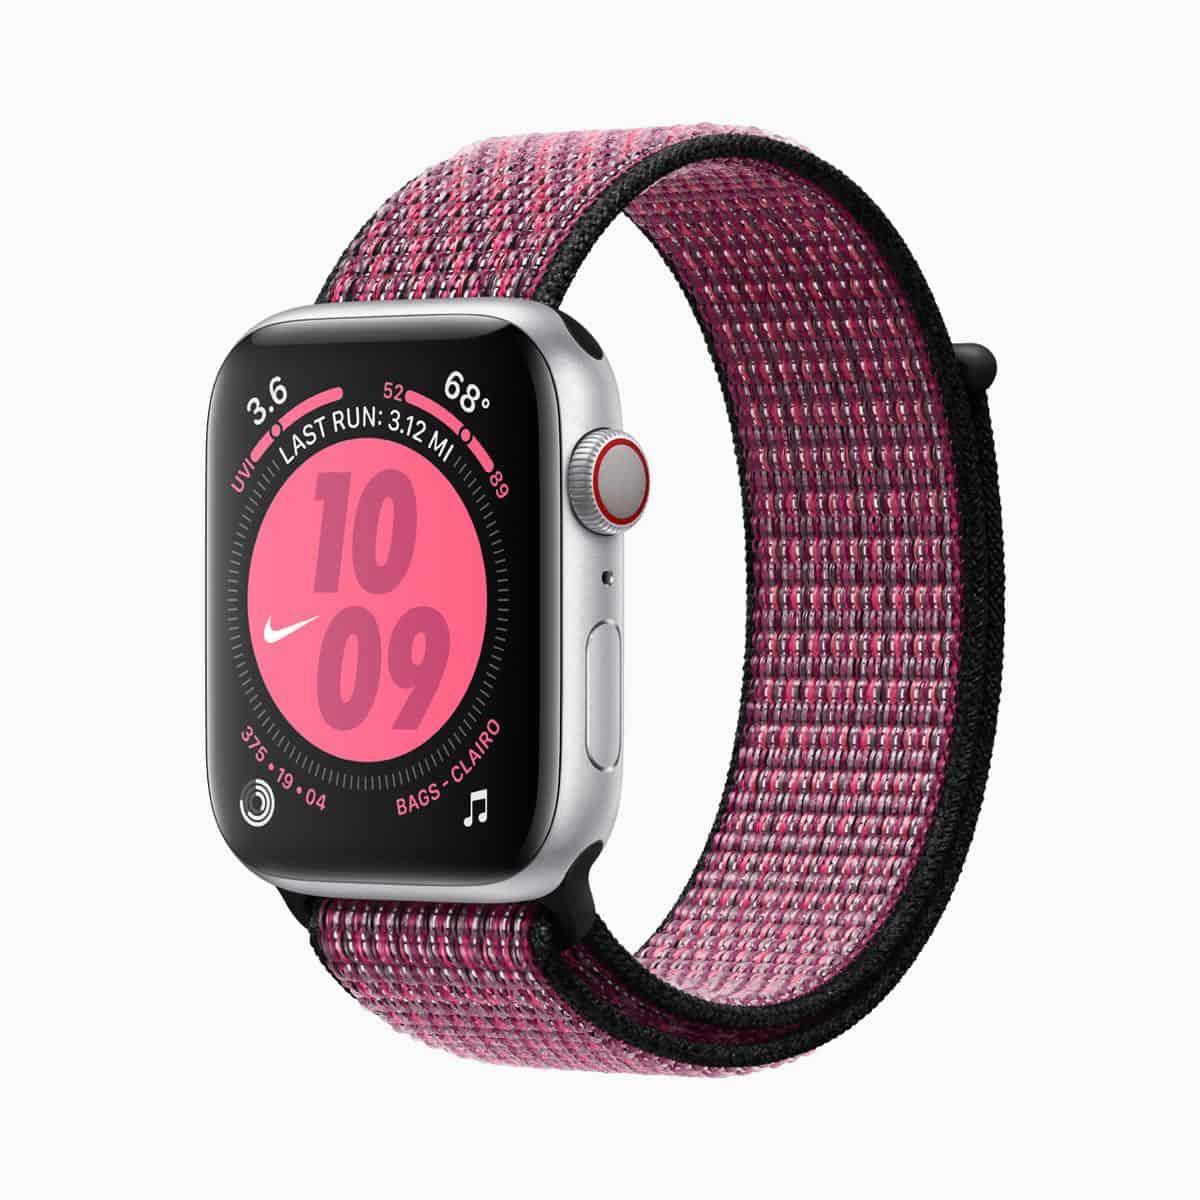 Apple watch series 5 nike sports band pink blast 091019